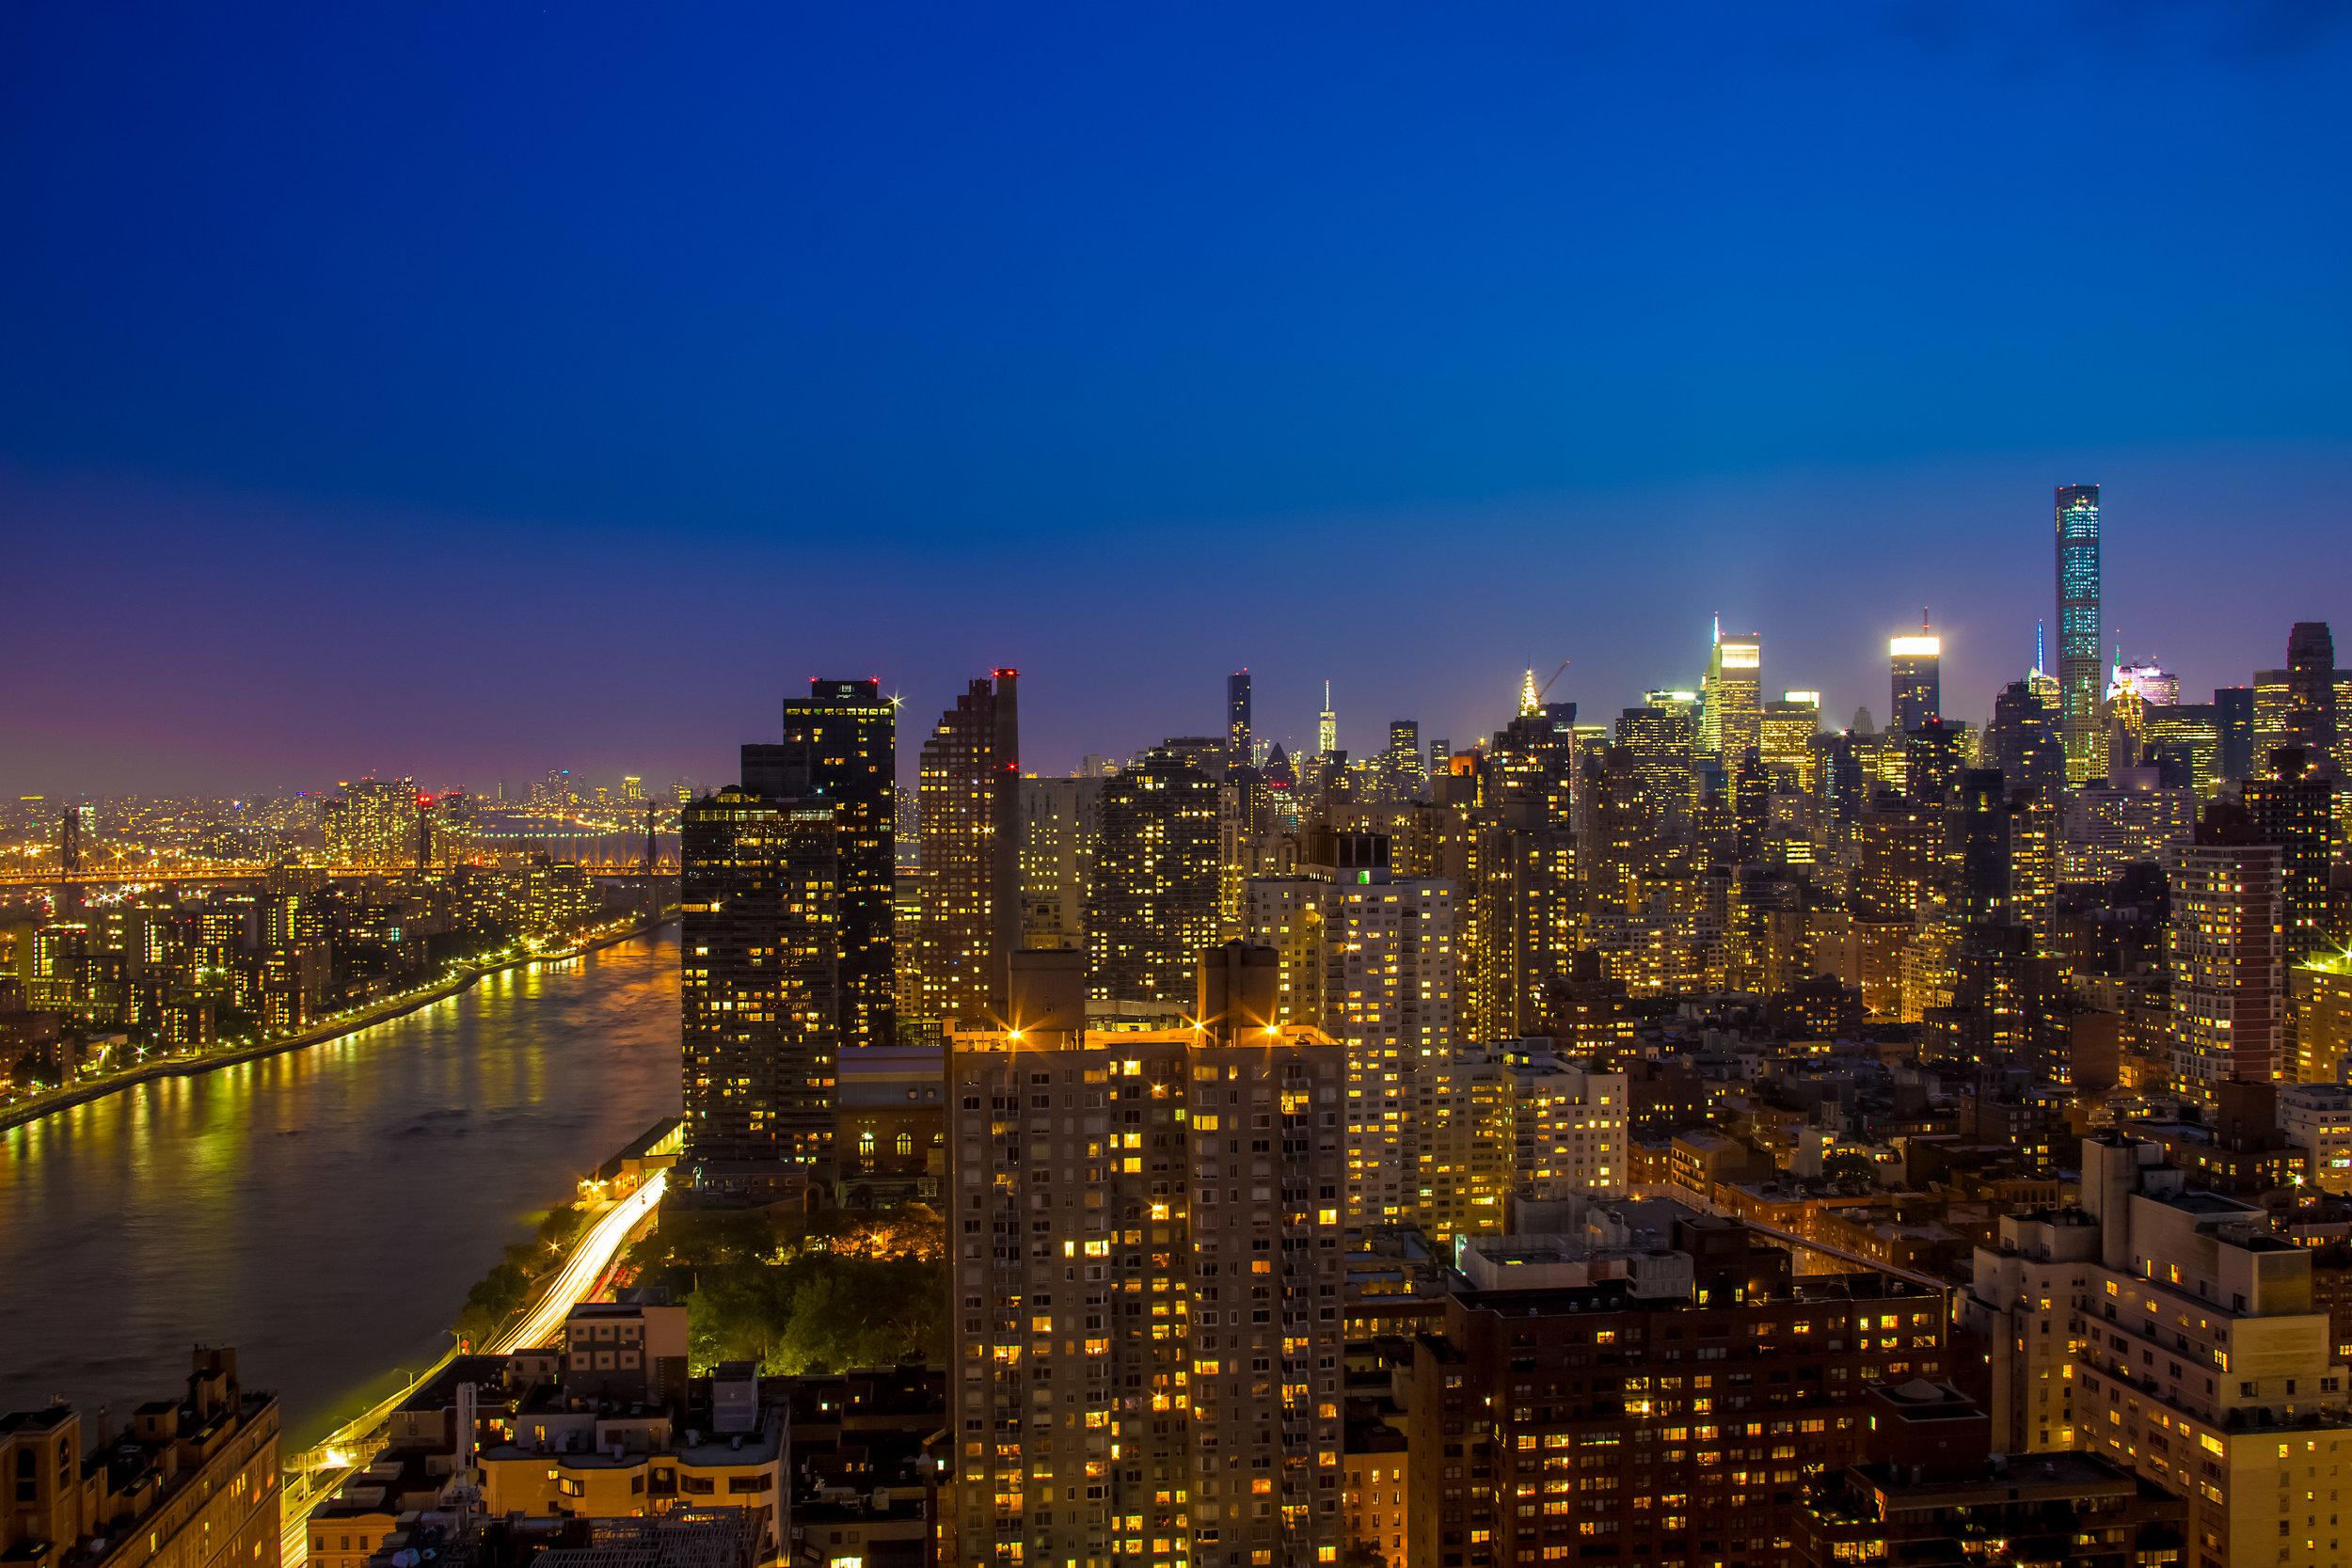 LSNY_Night_City_Views-12.jpg